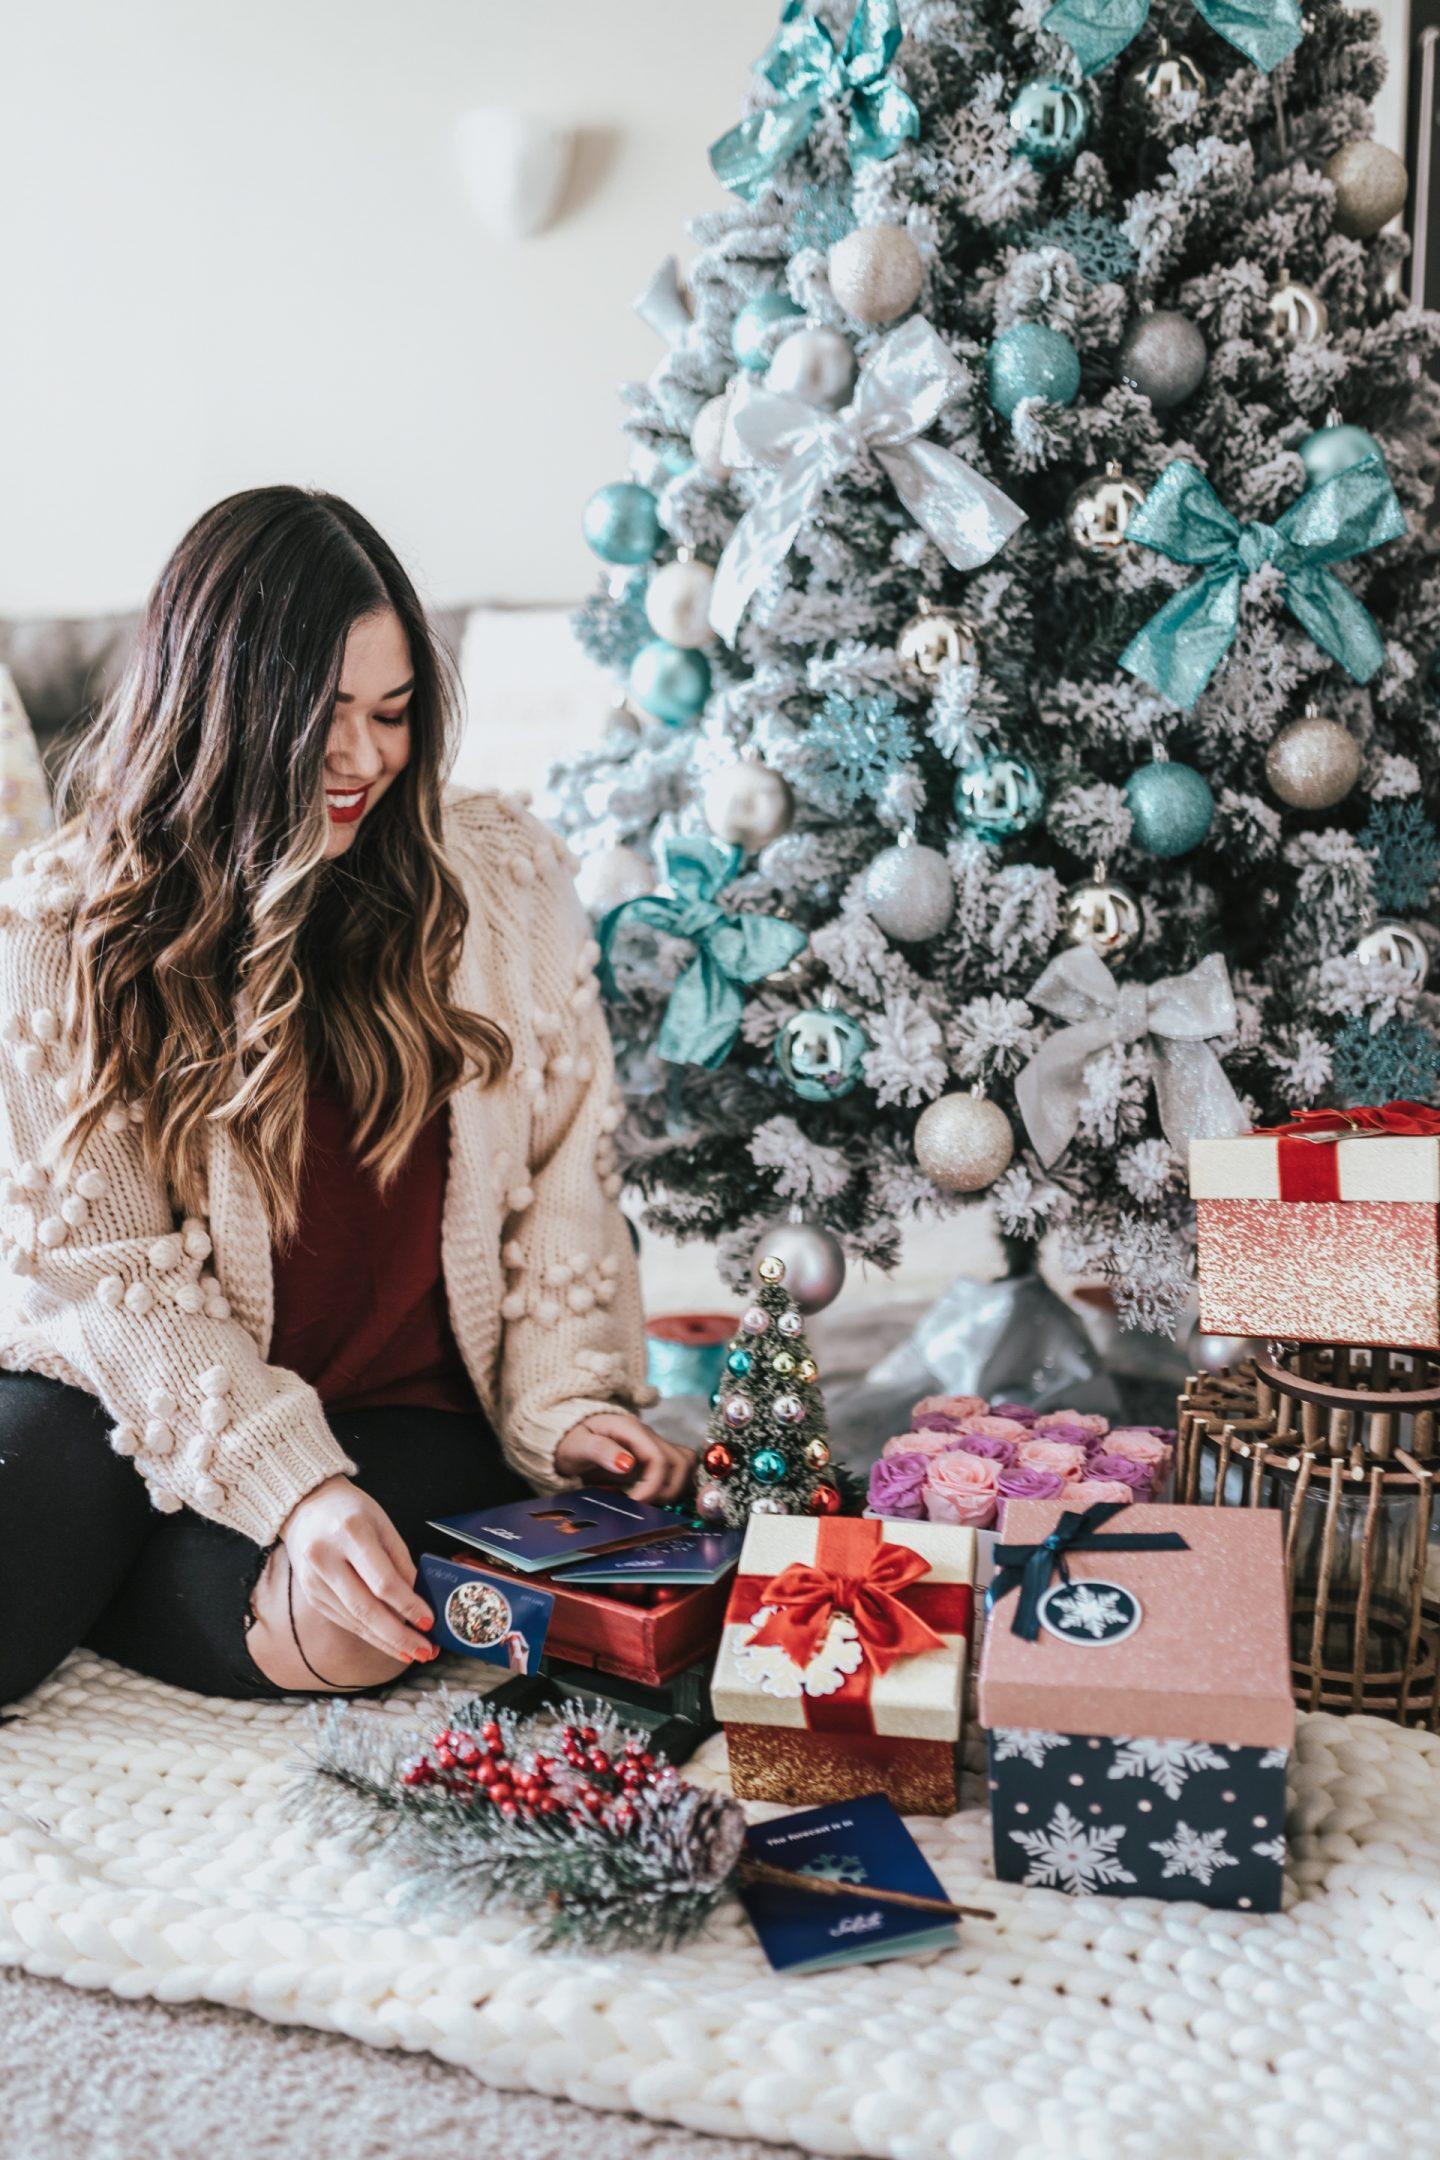 Salata Gift Cards: The Perfect Christmas Gift